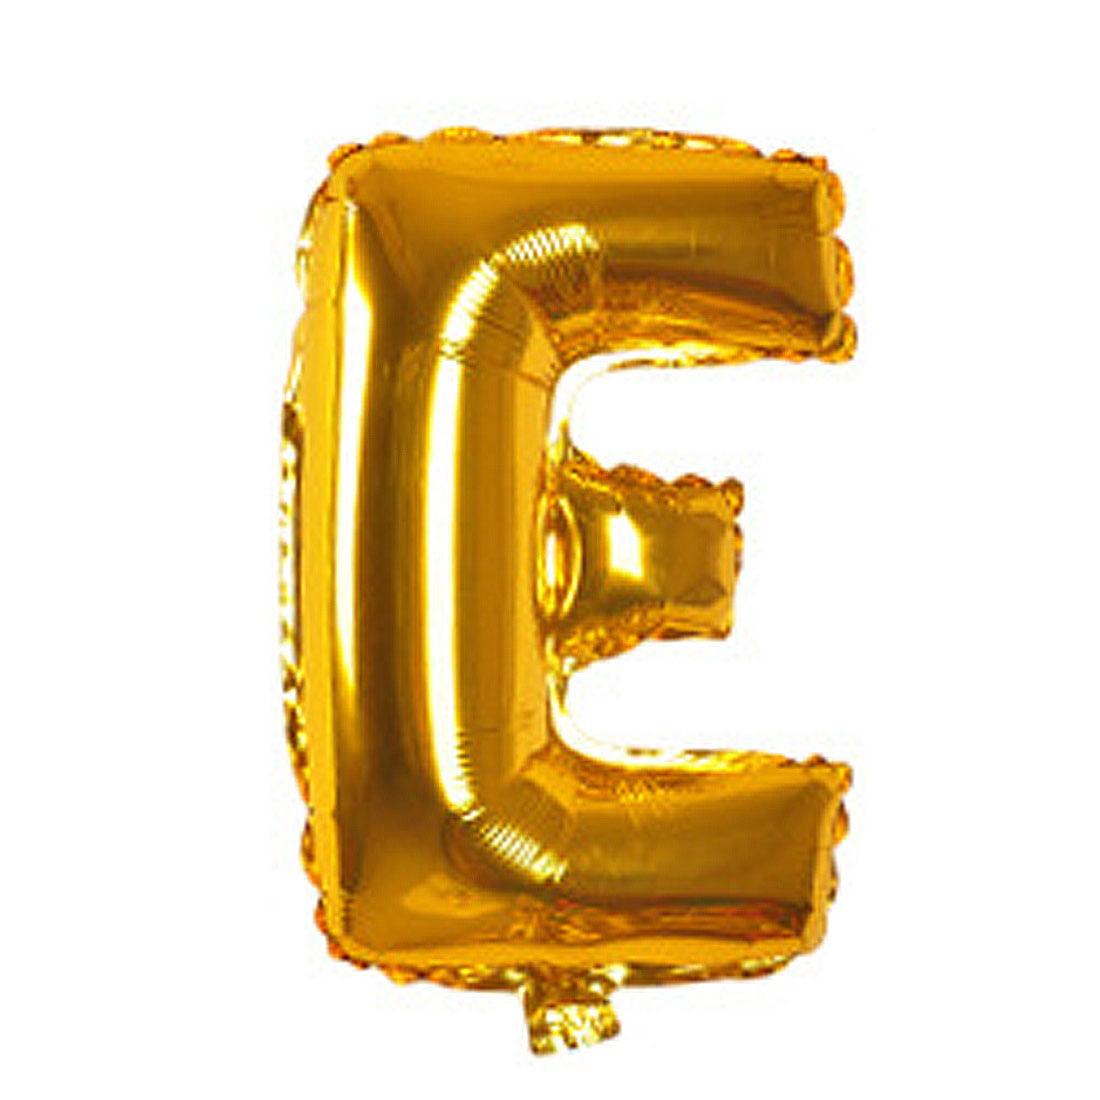 "Unique Bargains 40"" Birthday Wedding Decor Letter E Shaped Helium Foil Balloon"